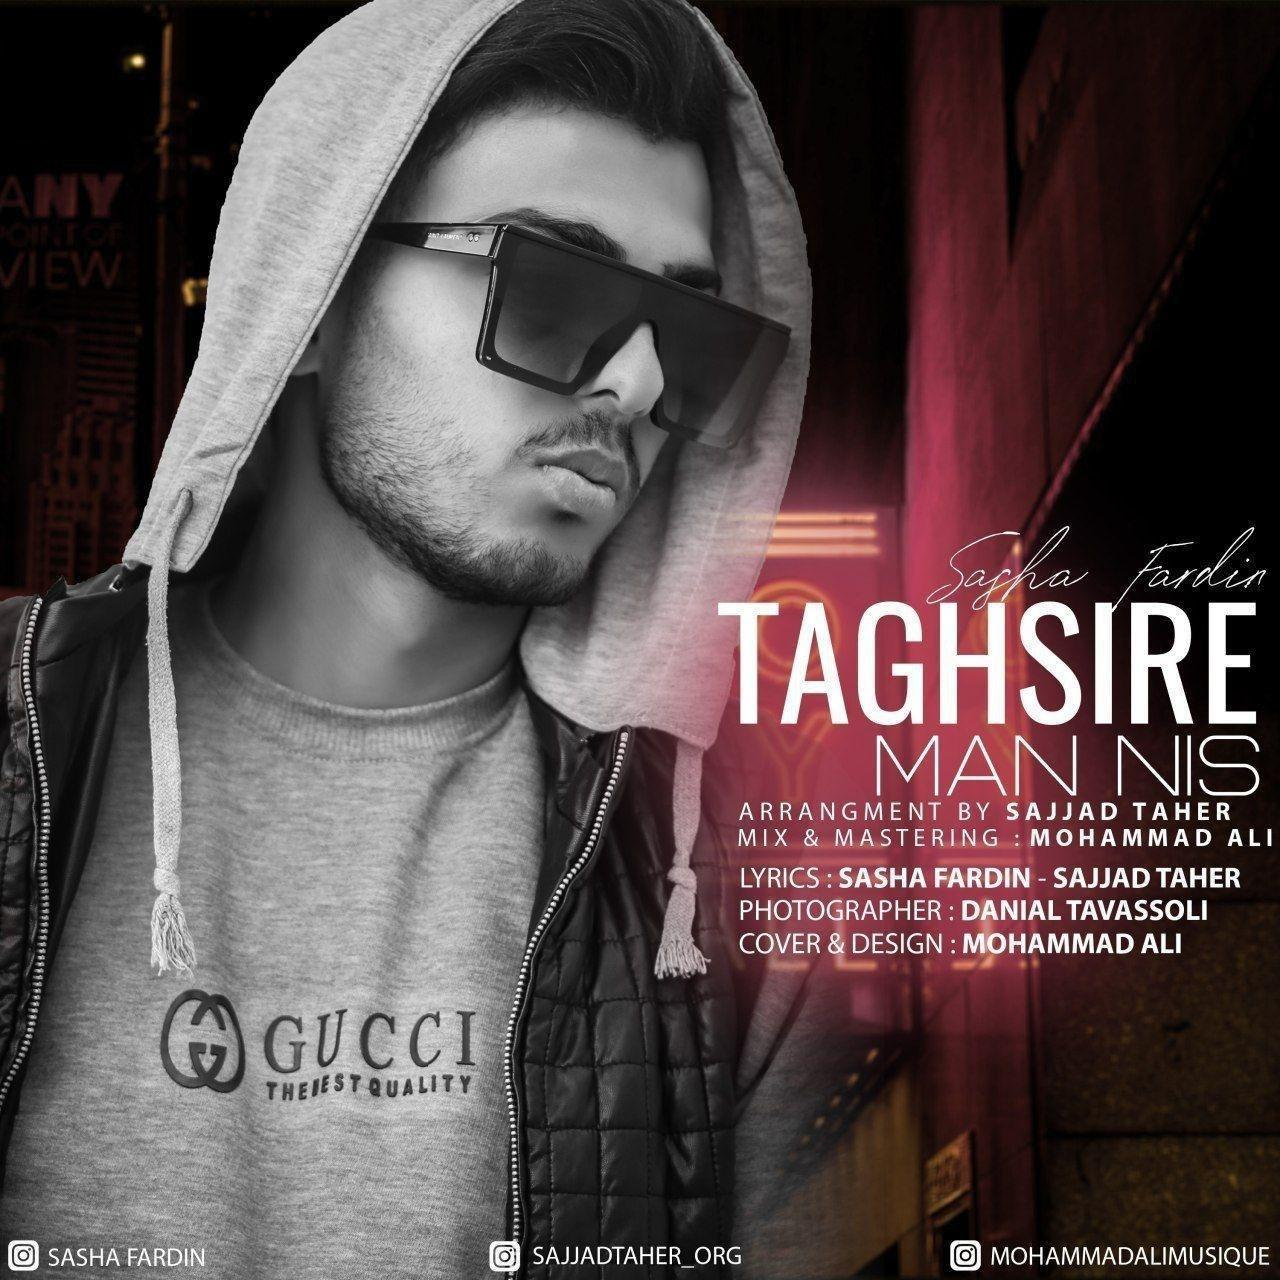 Sasha Fardin – Taghsire Man Nis